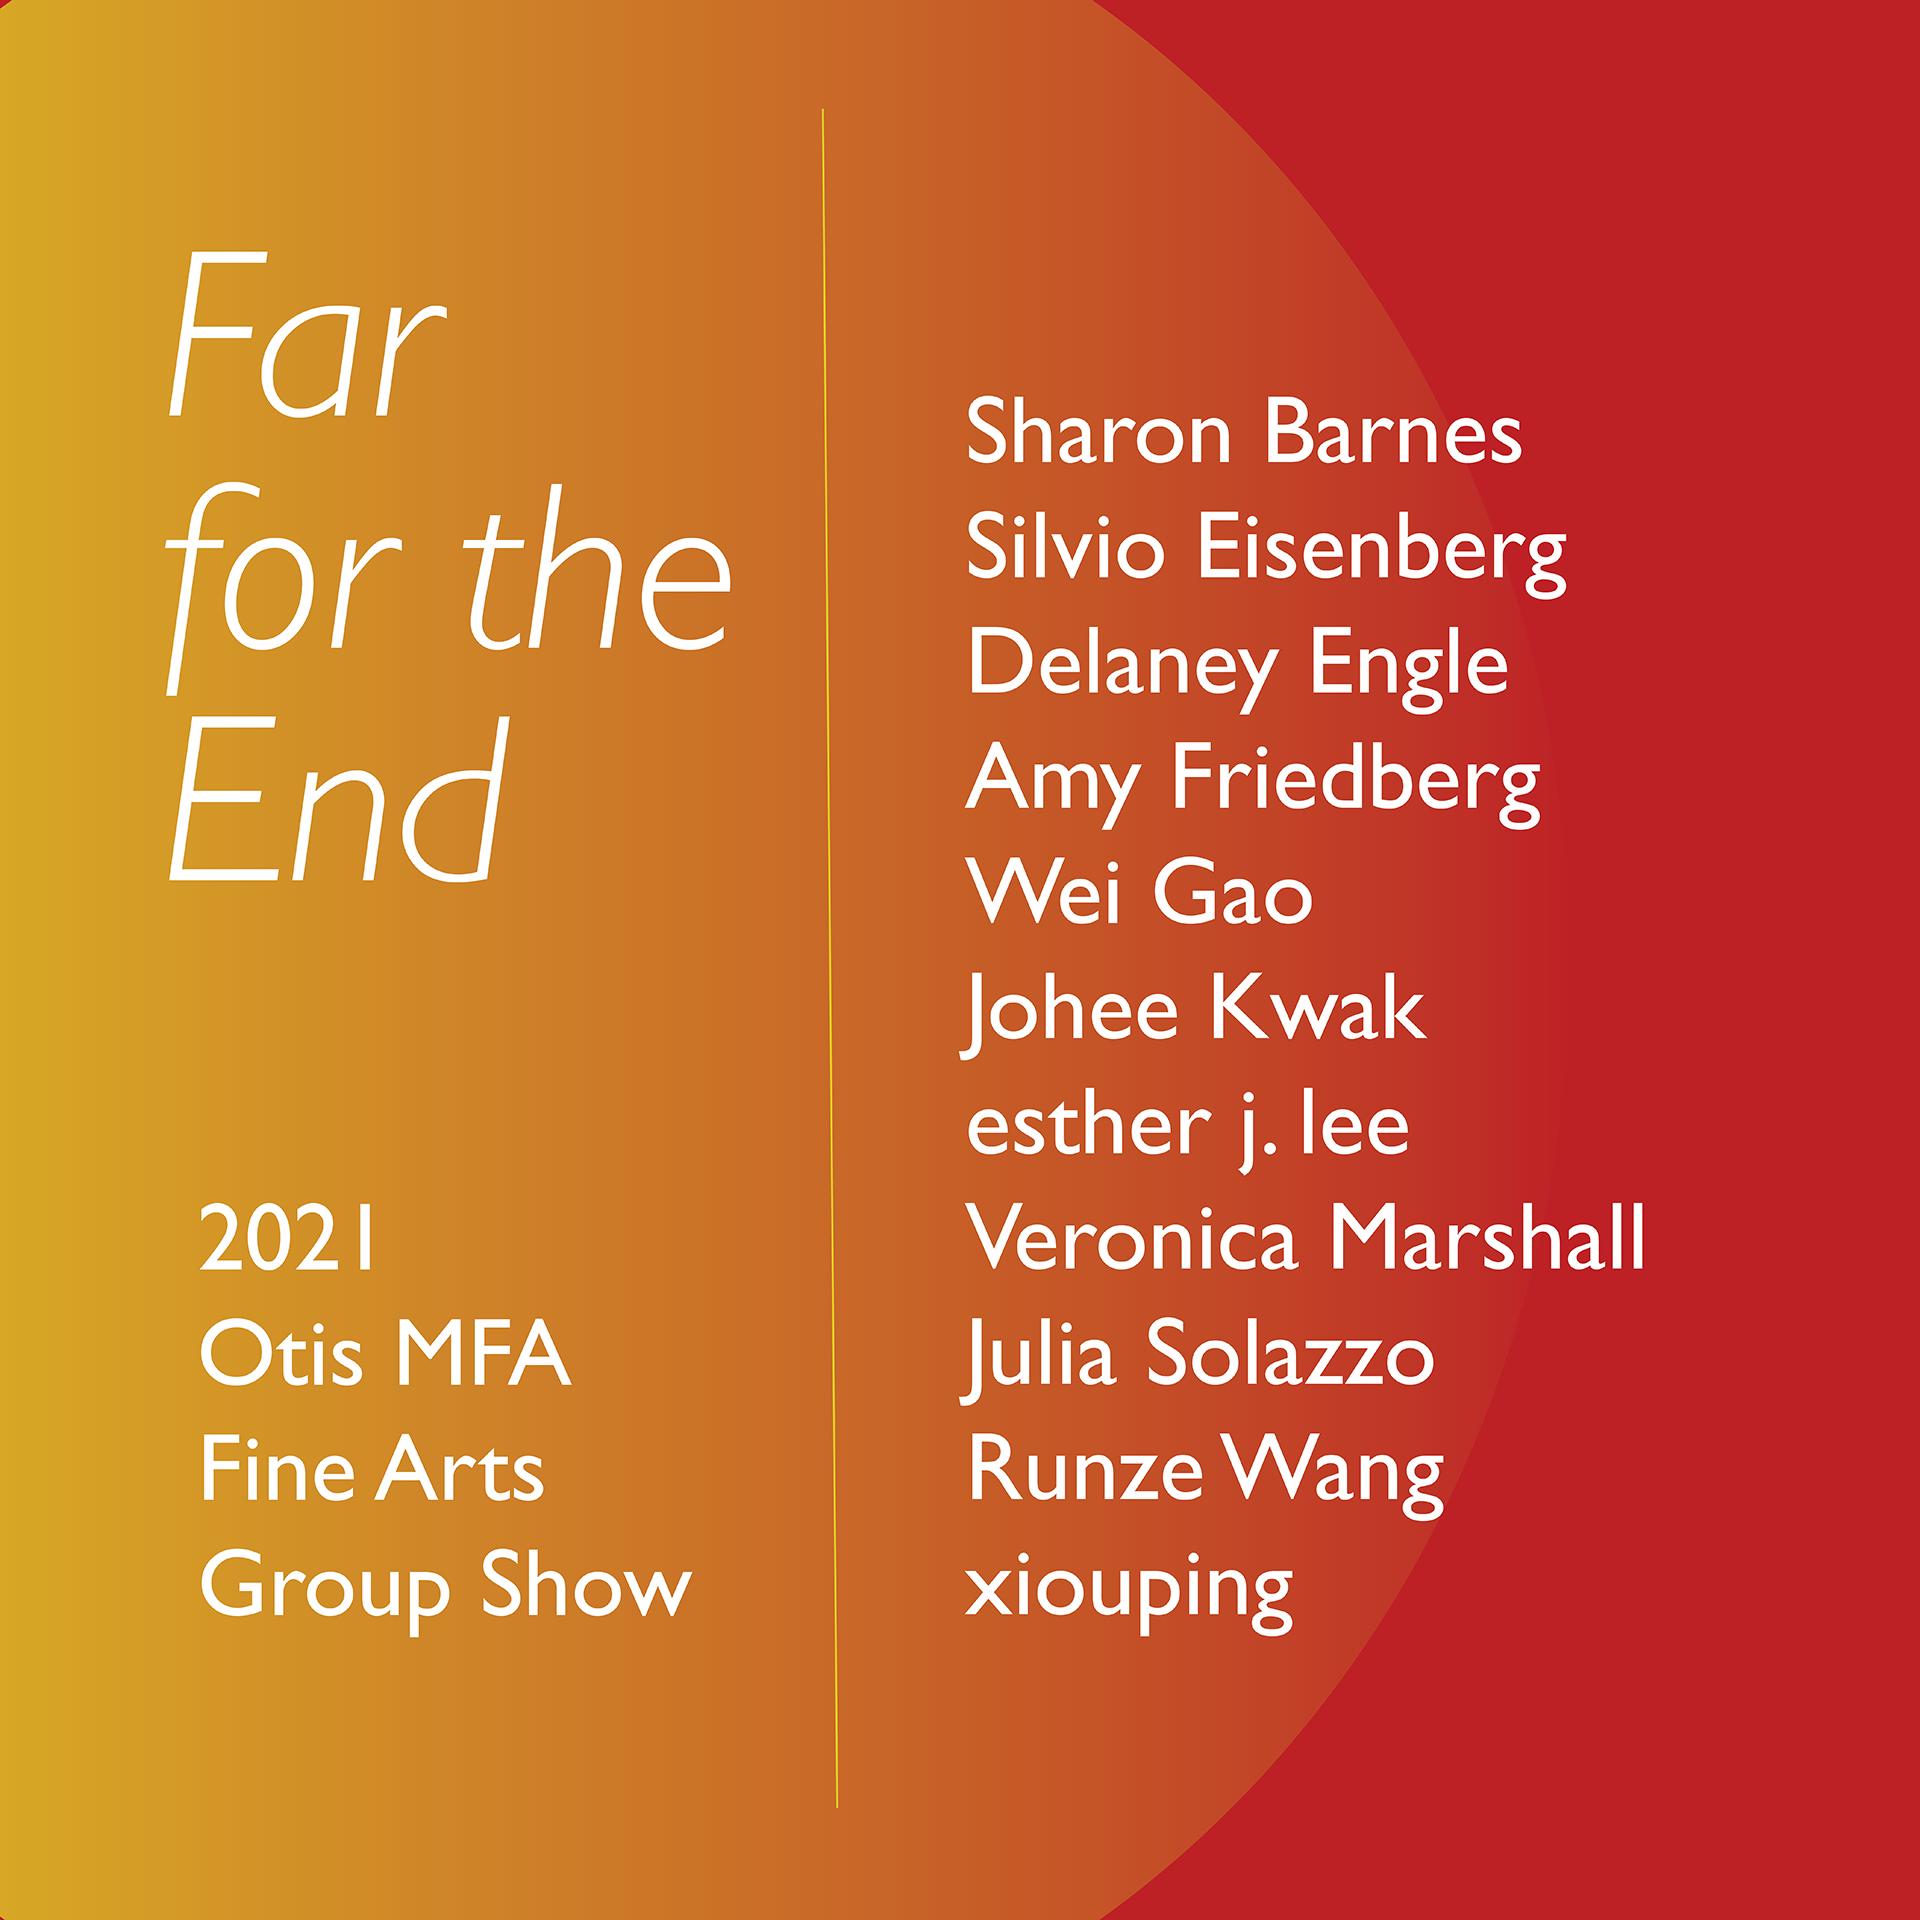 2021 Otis MFA Fine Arts Group Show